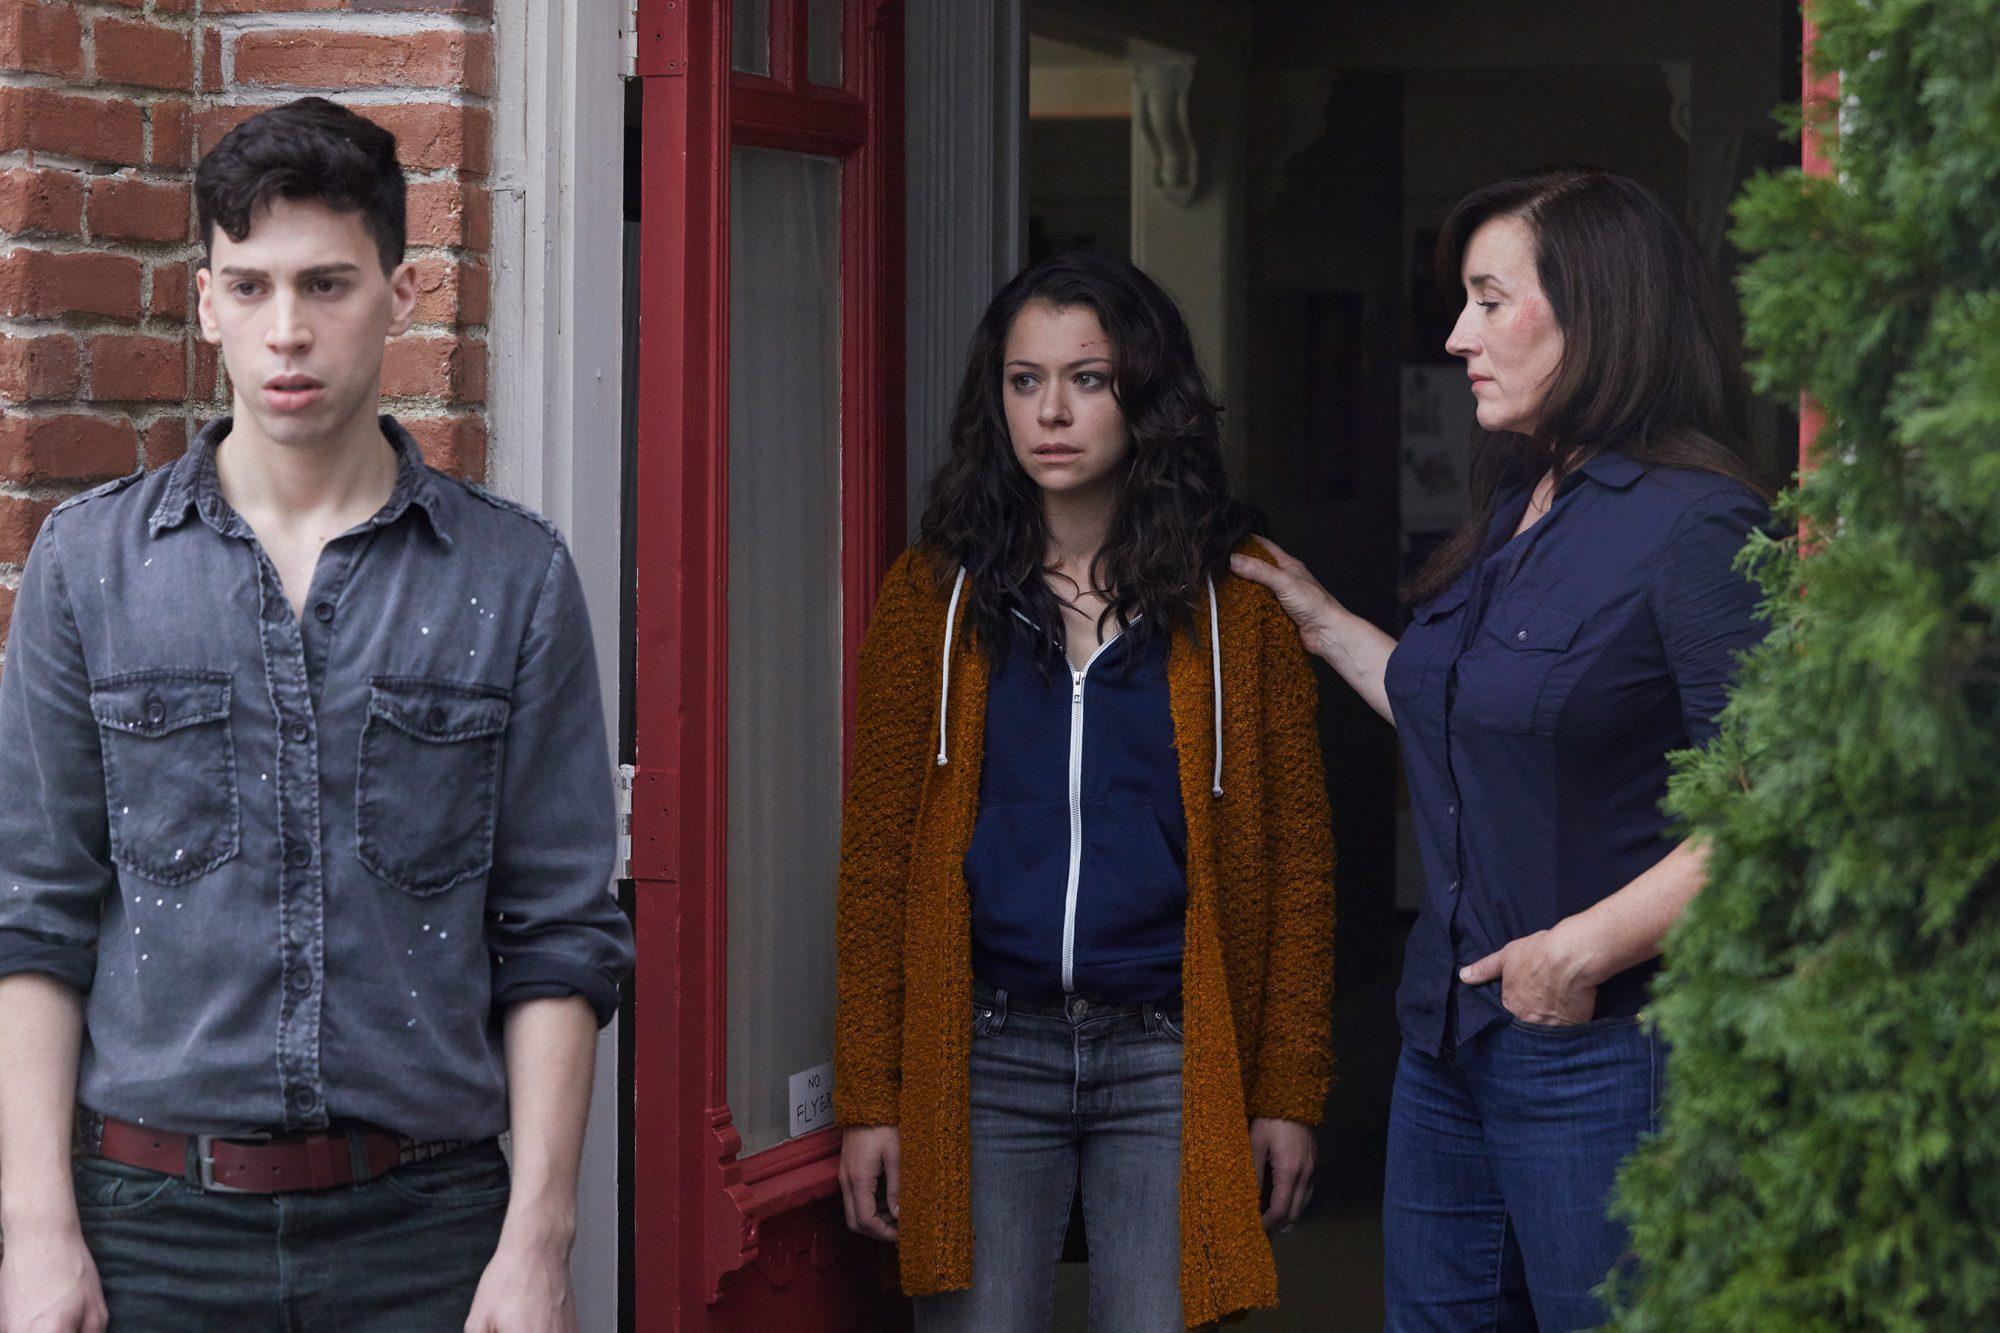 Felix (Jordan Gavaris), Sarah (Tatiana Maslany), Mrs. S (Maria Doyle Kennedy)